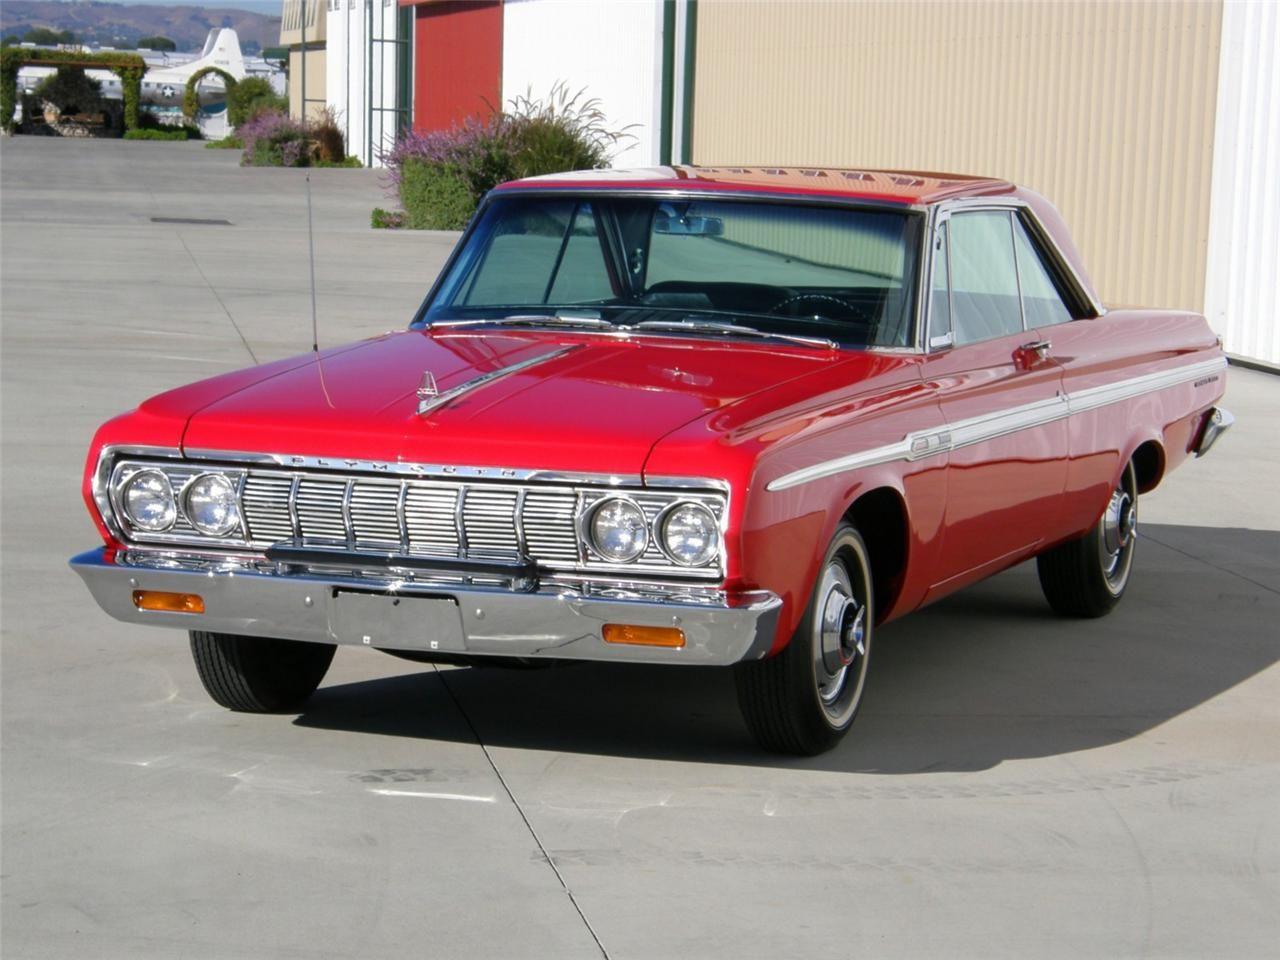 1964 Plymouth Sport Fury No Car Like a MOPAR Pinterest